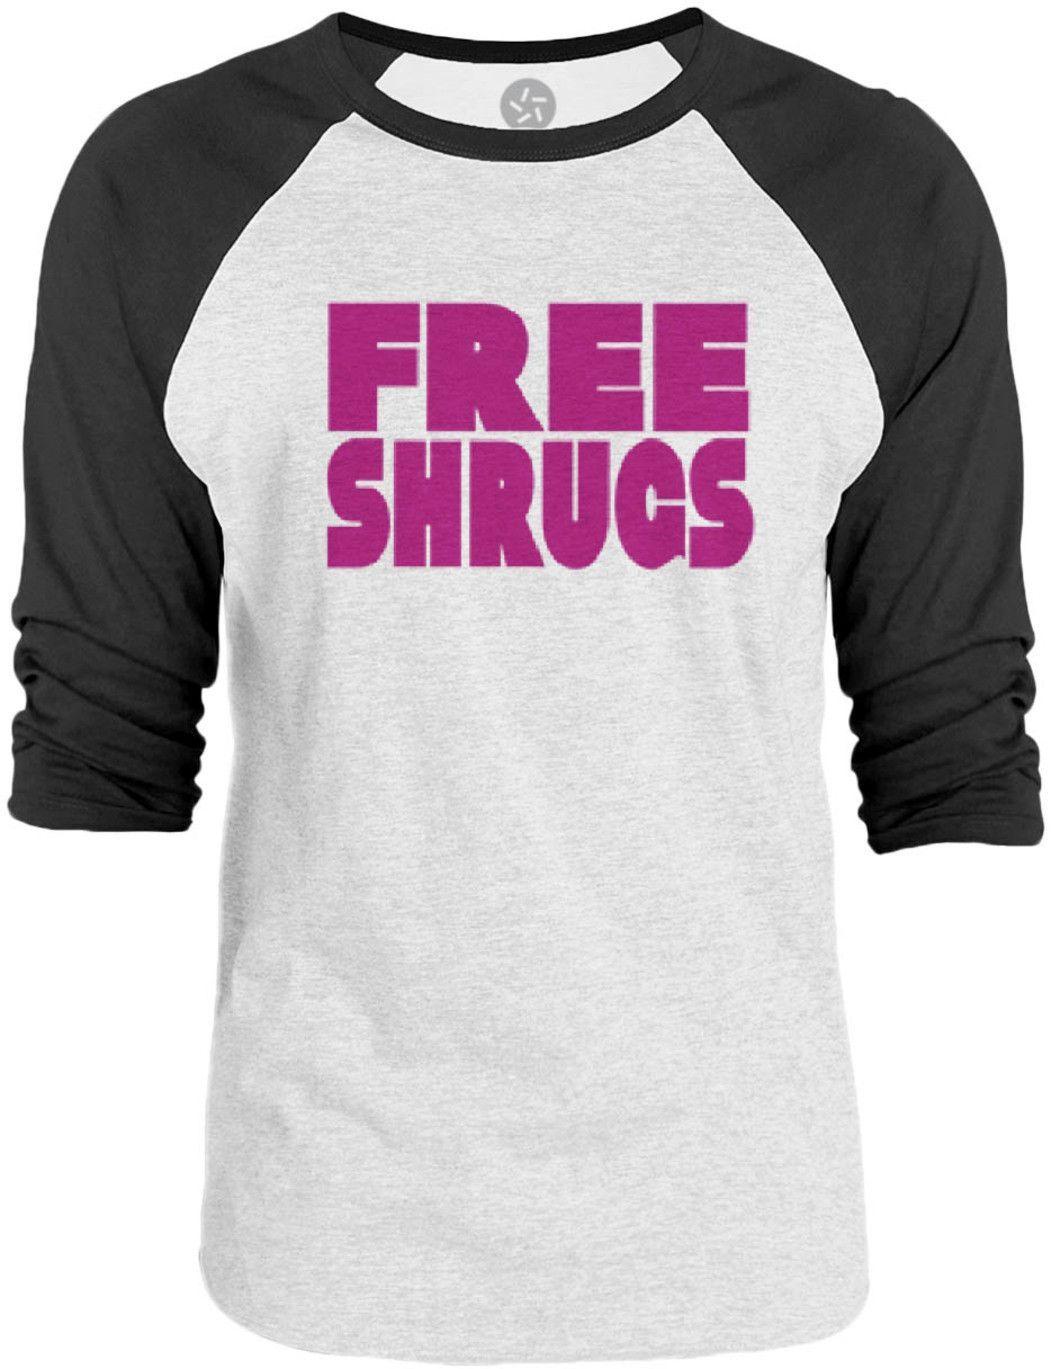 Big Texas Free Shrugs (Fuchsia) 3/4-Sleeve Raglan Baseball T-Shirt